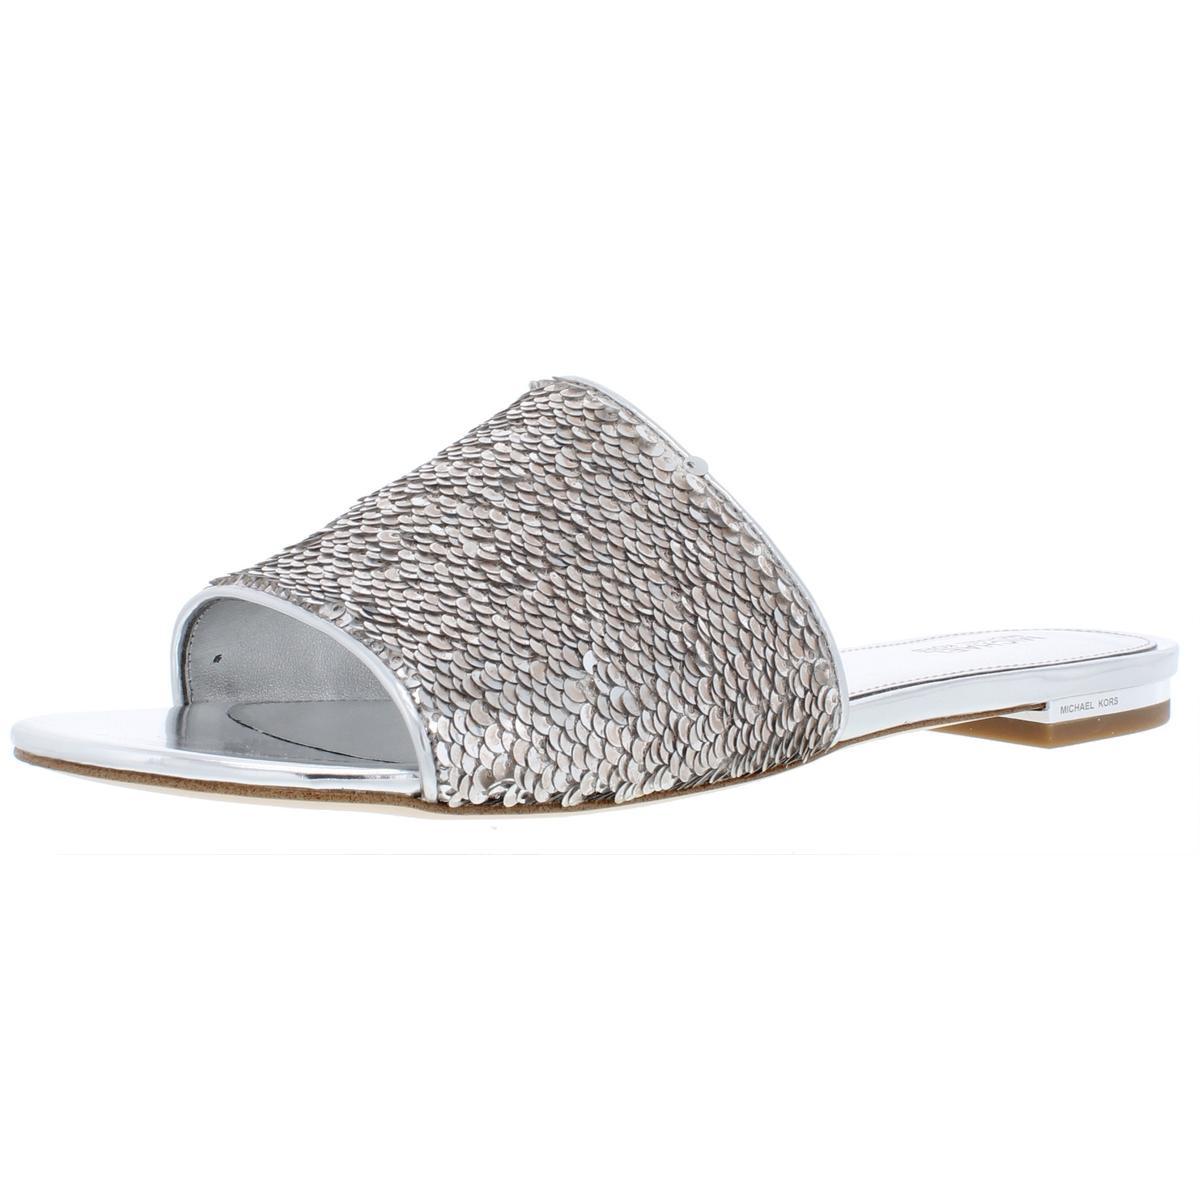 ce2060b35040 Details about MICHAEL Michael Kors Womens Shelly Metallic Flats Slide  Sandals Shoes BHFO 9412